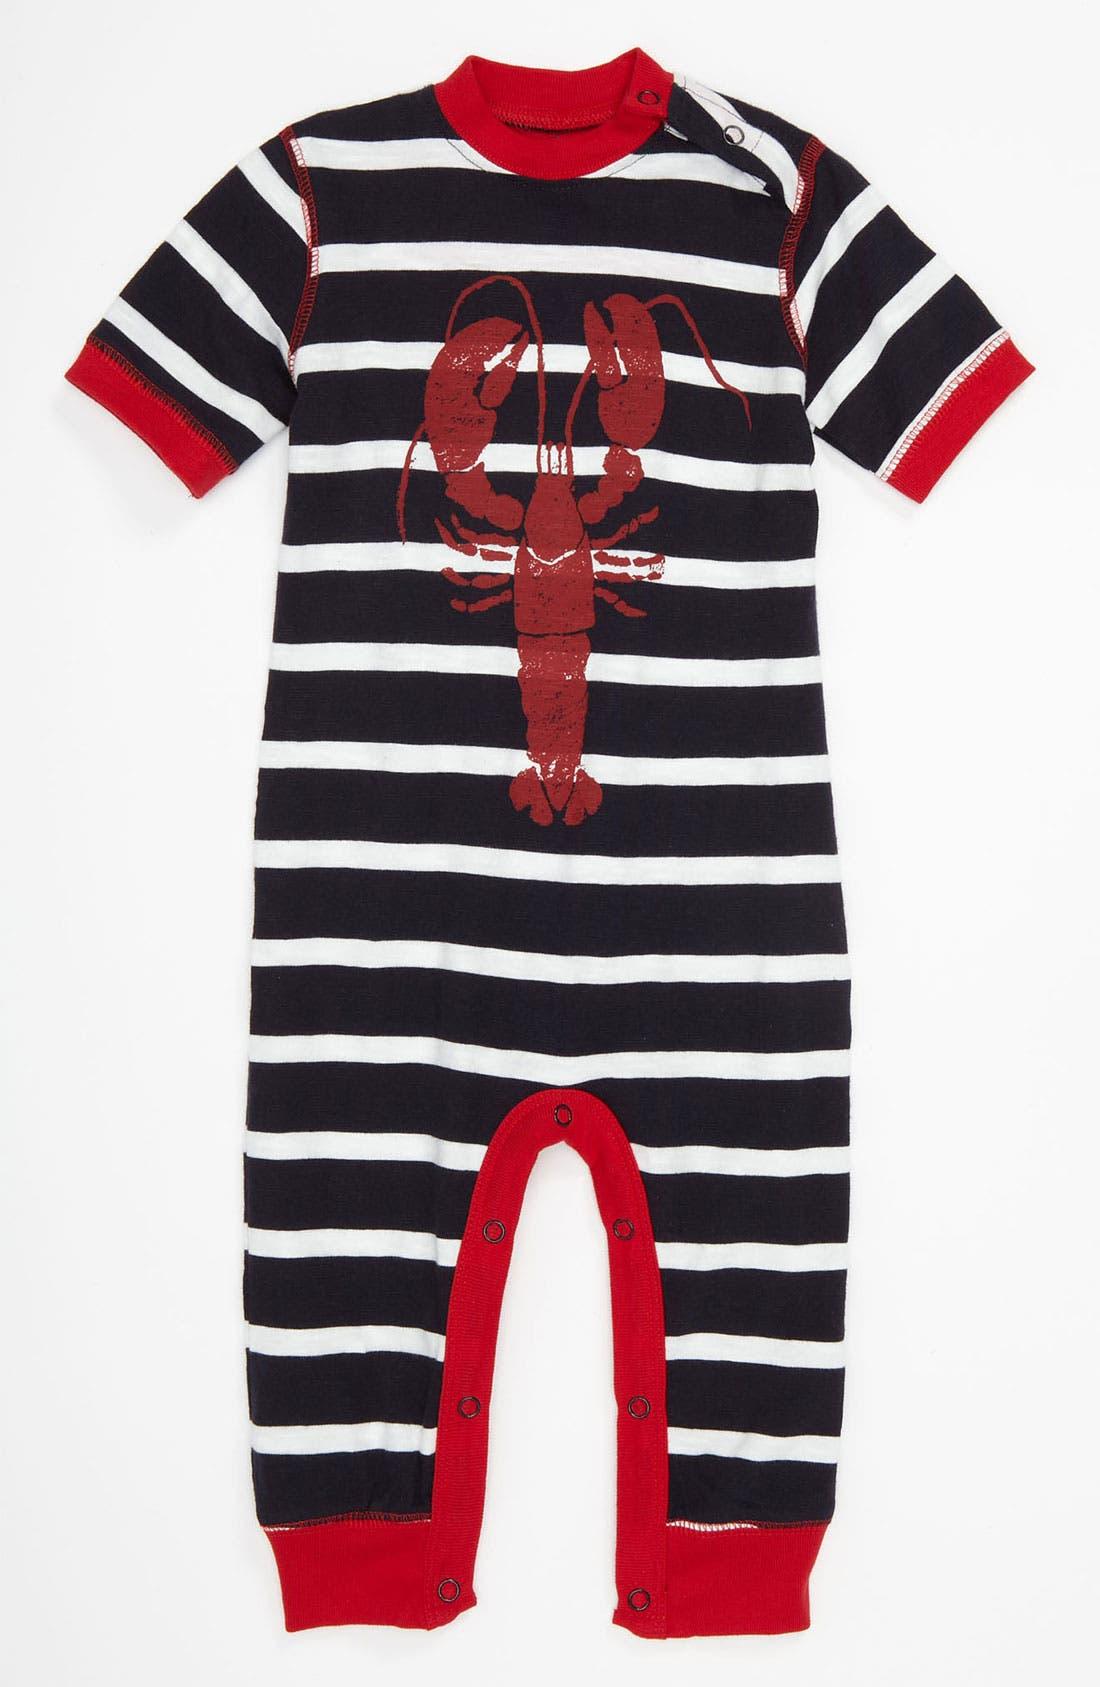 Alternate Image 1 Selected - Hatley 'Lobster' Stripe Pajamas (Infant)